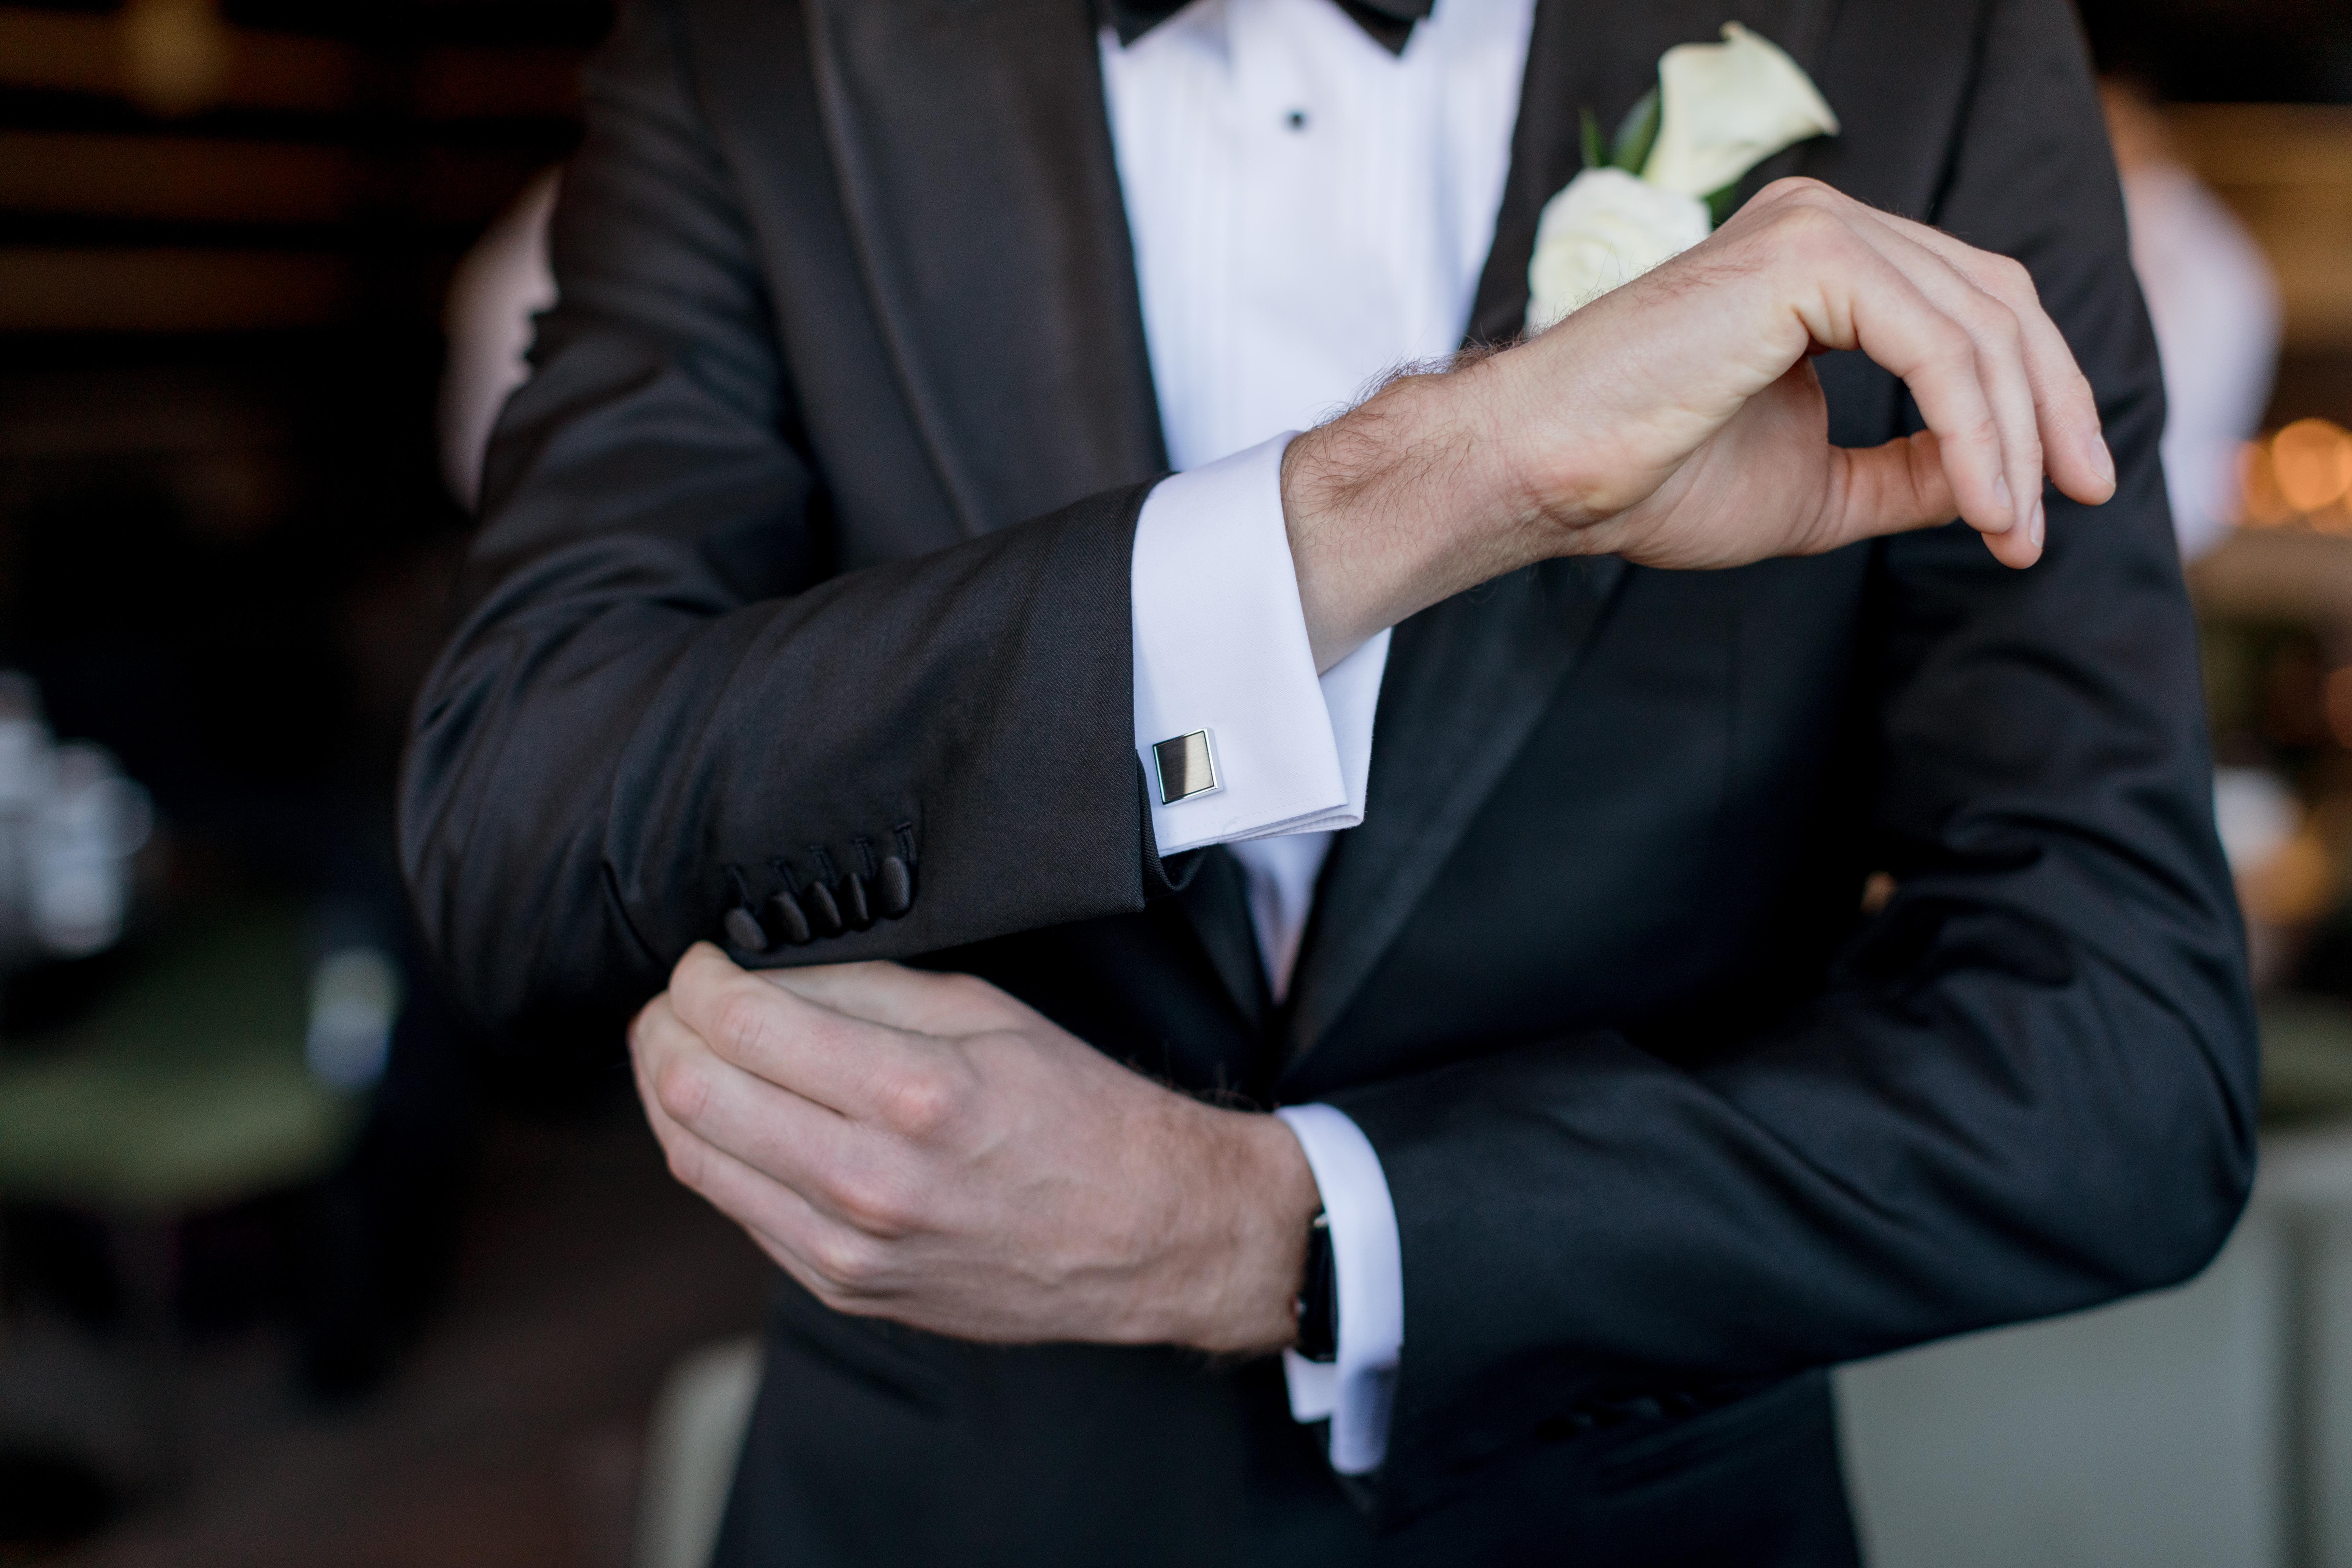 Ritz-Carlton-Bachelor-Gulch-Beaver-Creek-Colorado-Fall-Wedding-Groom-Cuff-Links